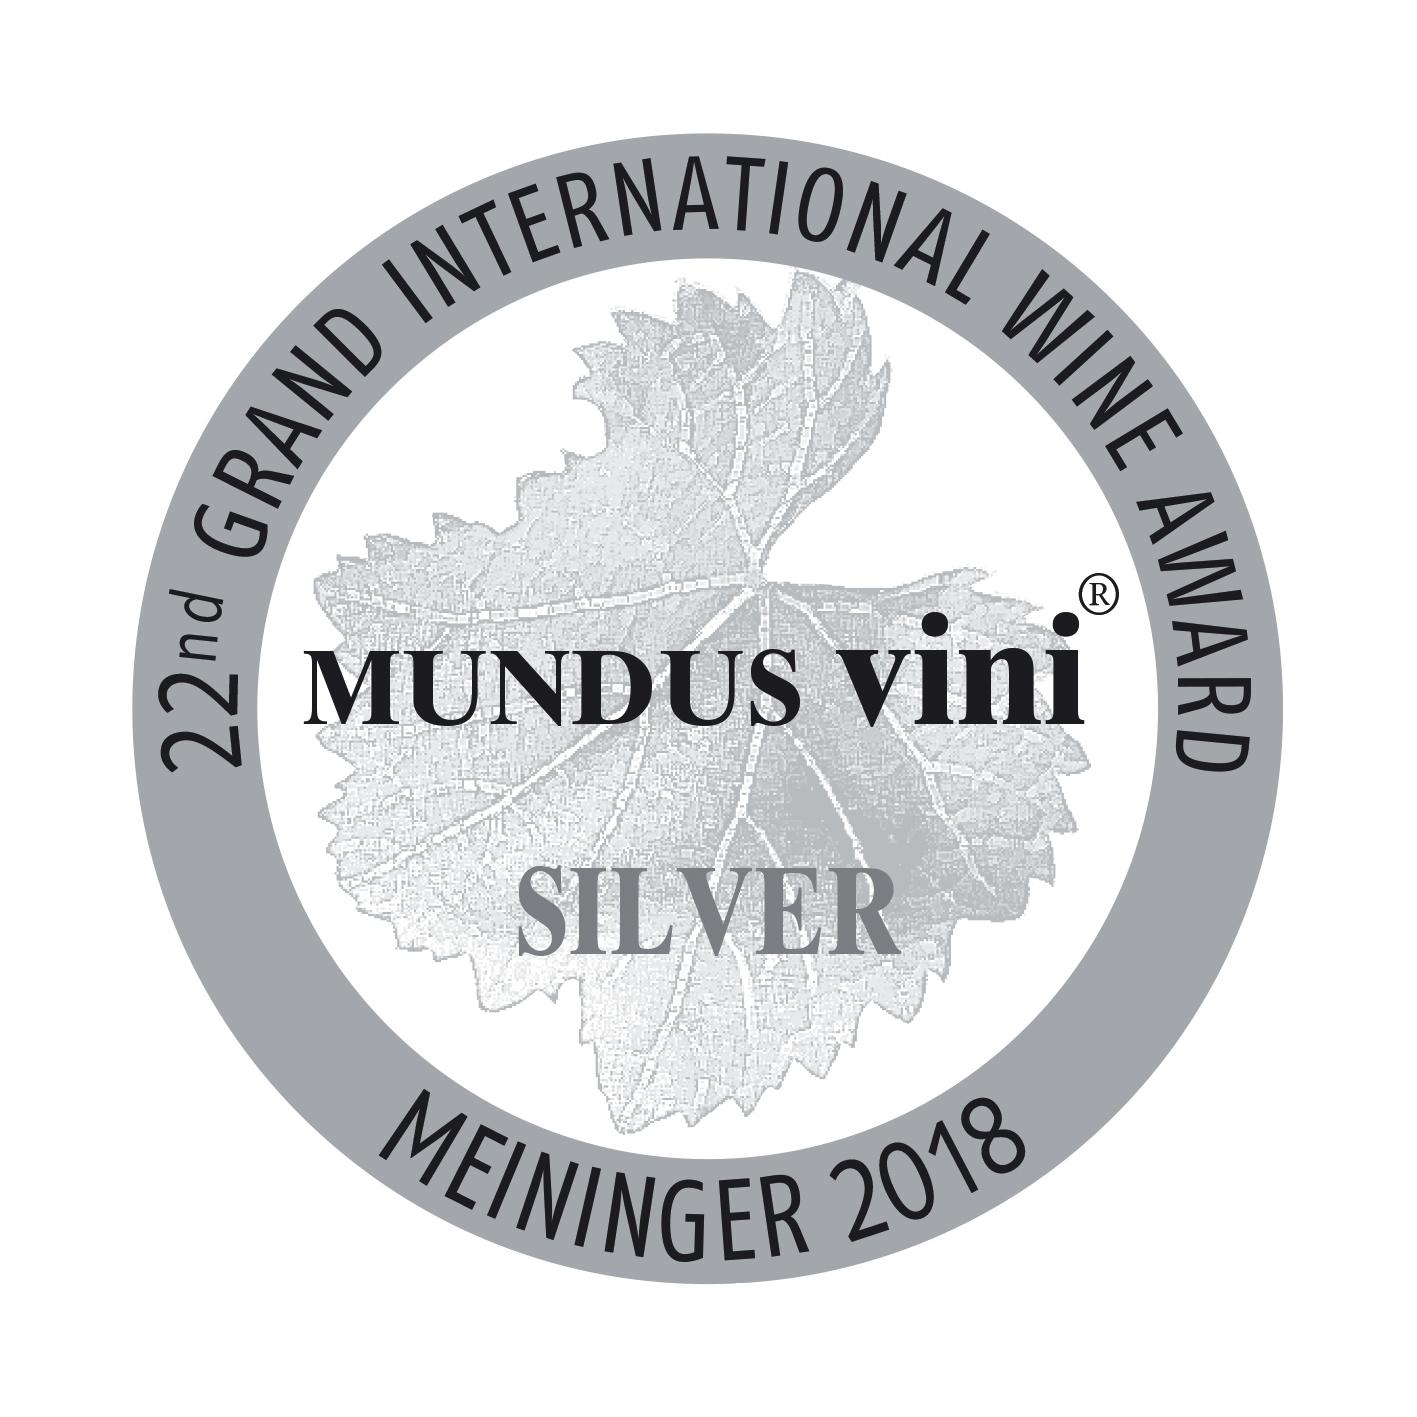 Mundus Vini Silber 2018